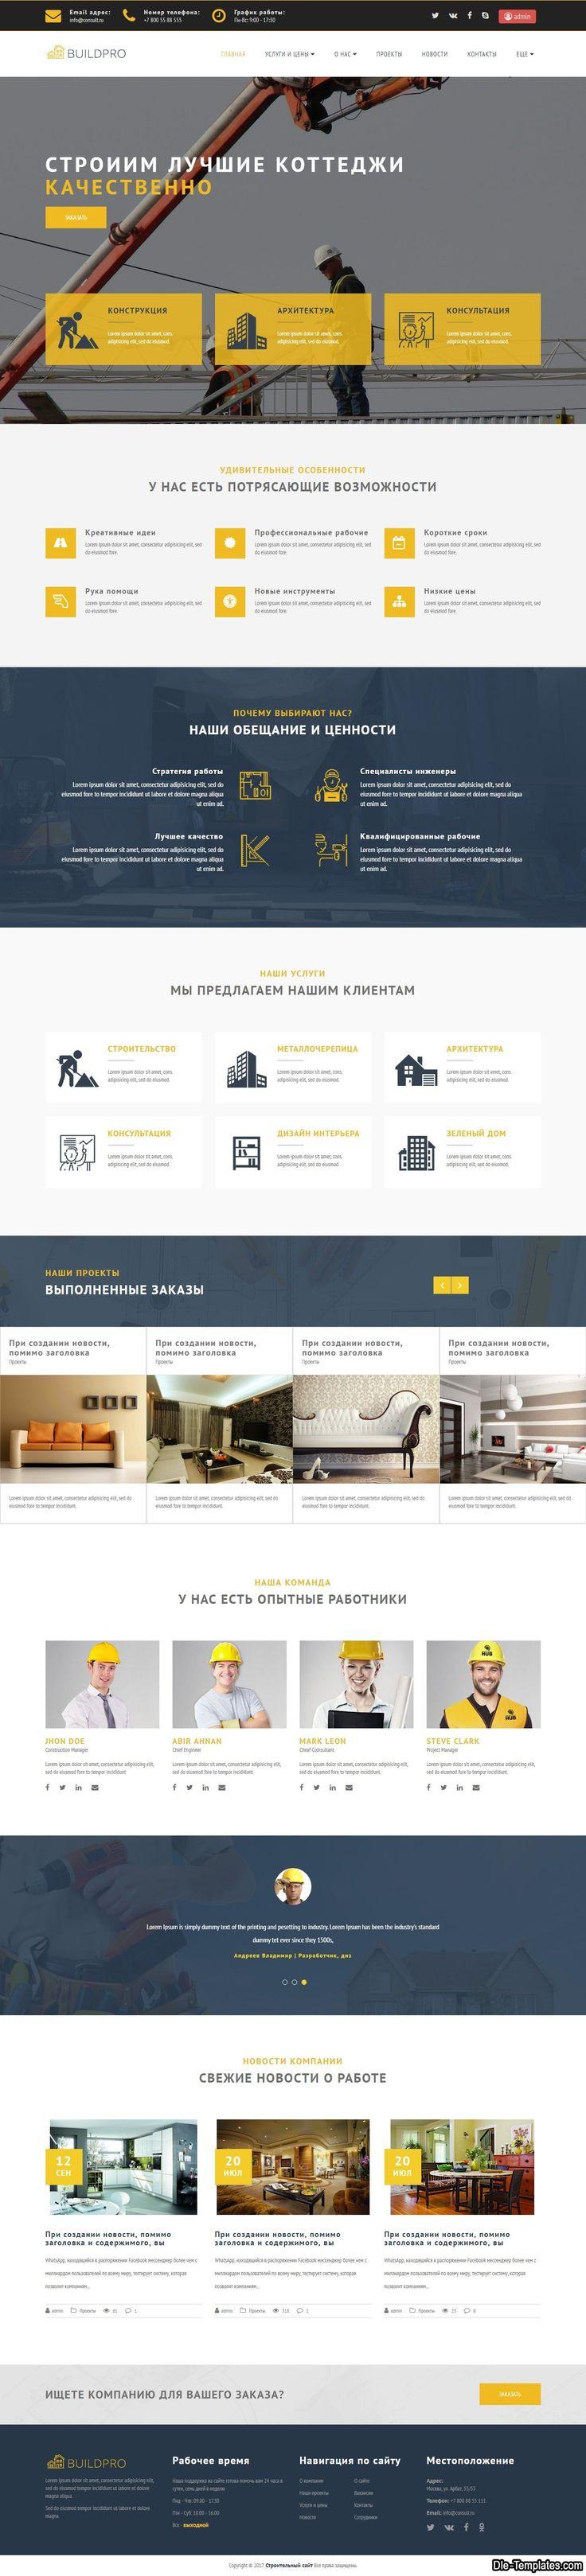 BuildPro - шаблон сайта строительной компании для DLE #templates #website #шаблон #сайт #web DataLife Engine (DLE)